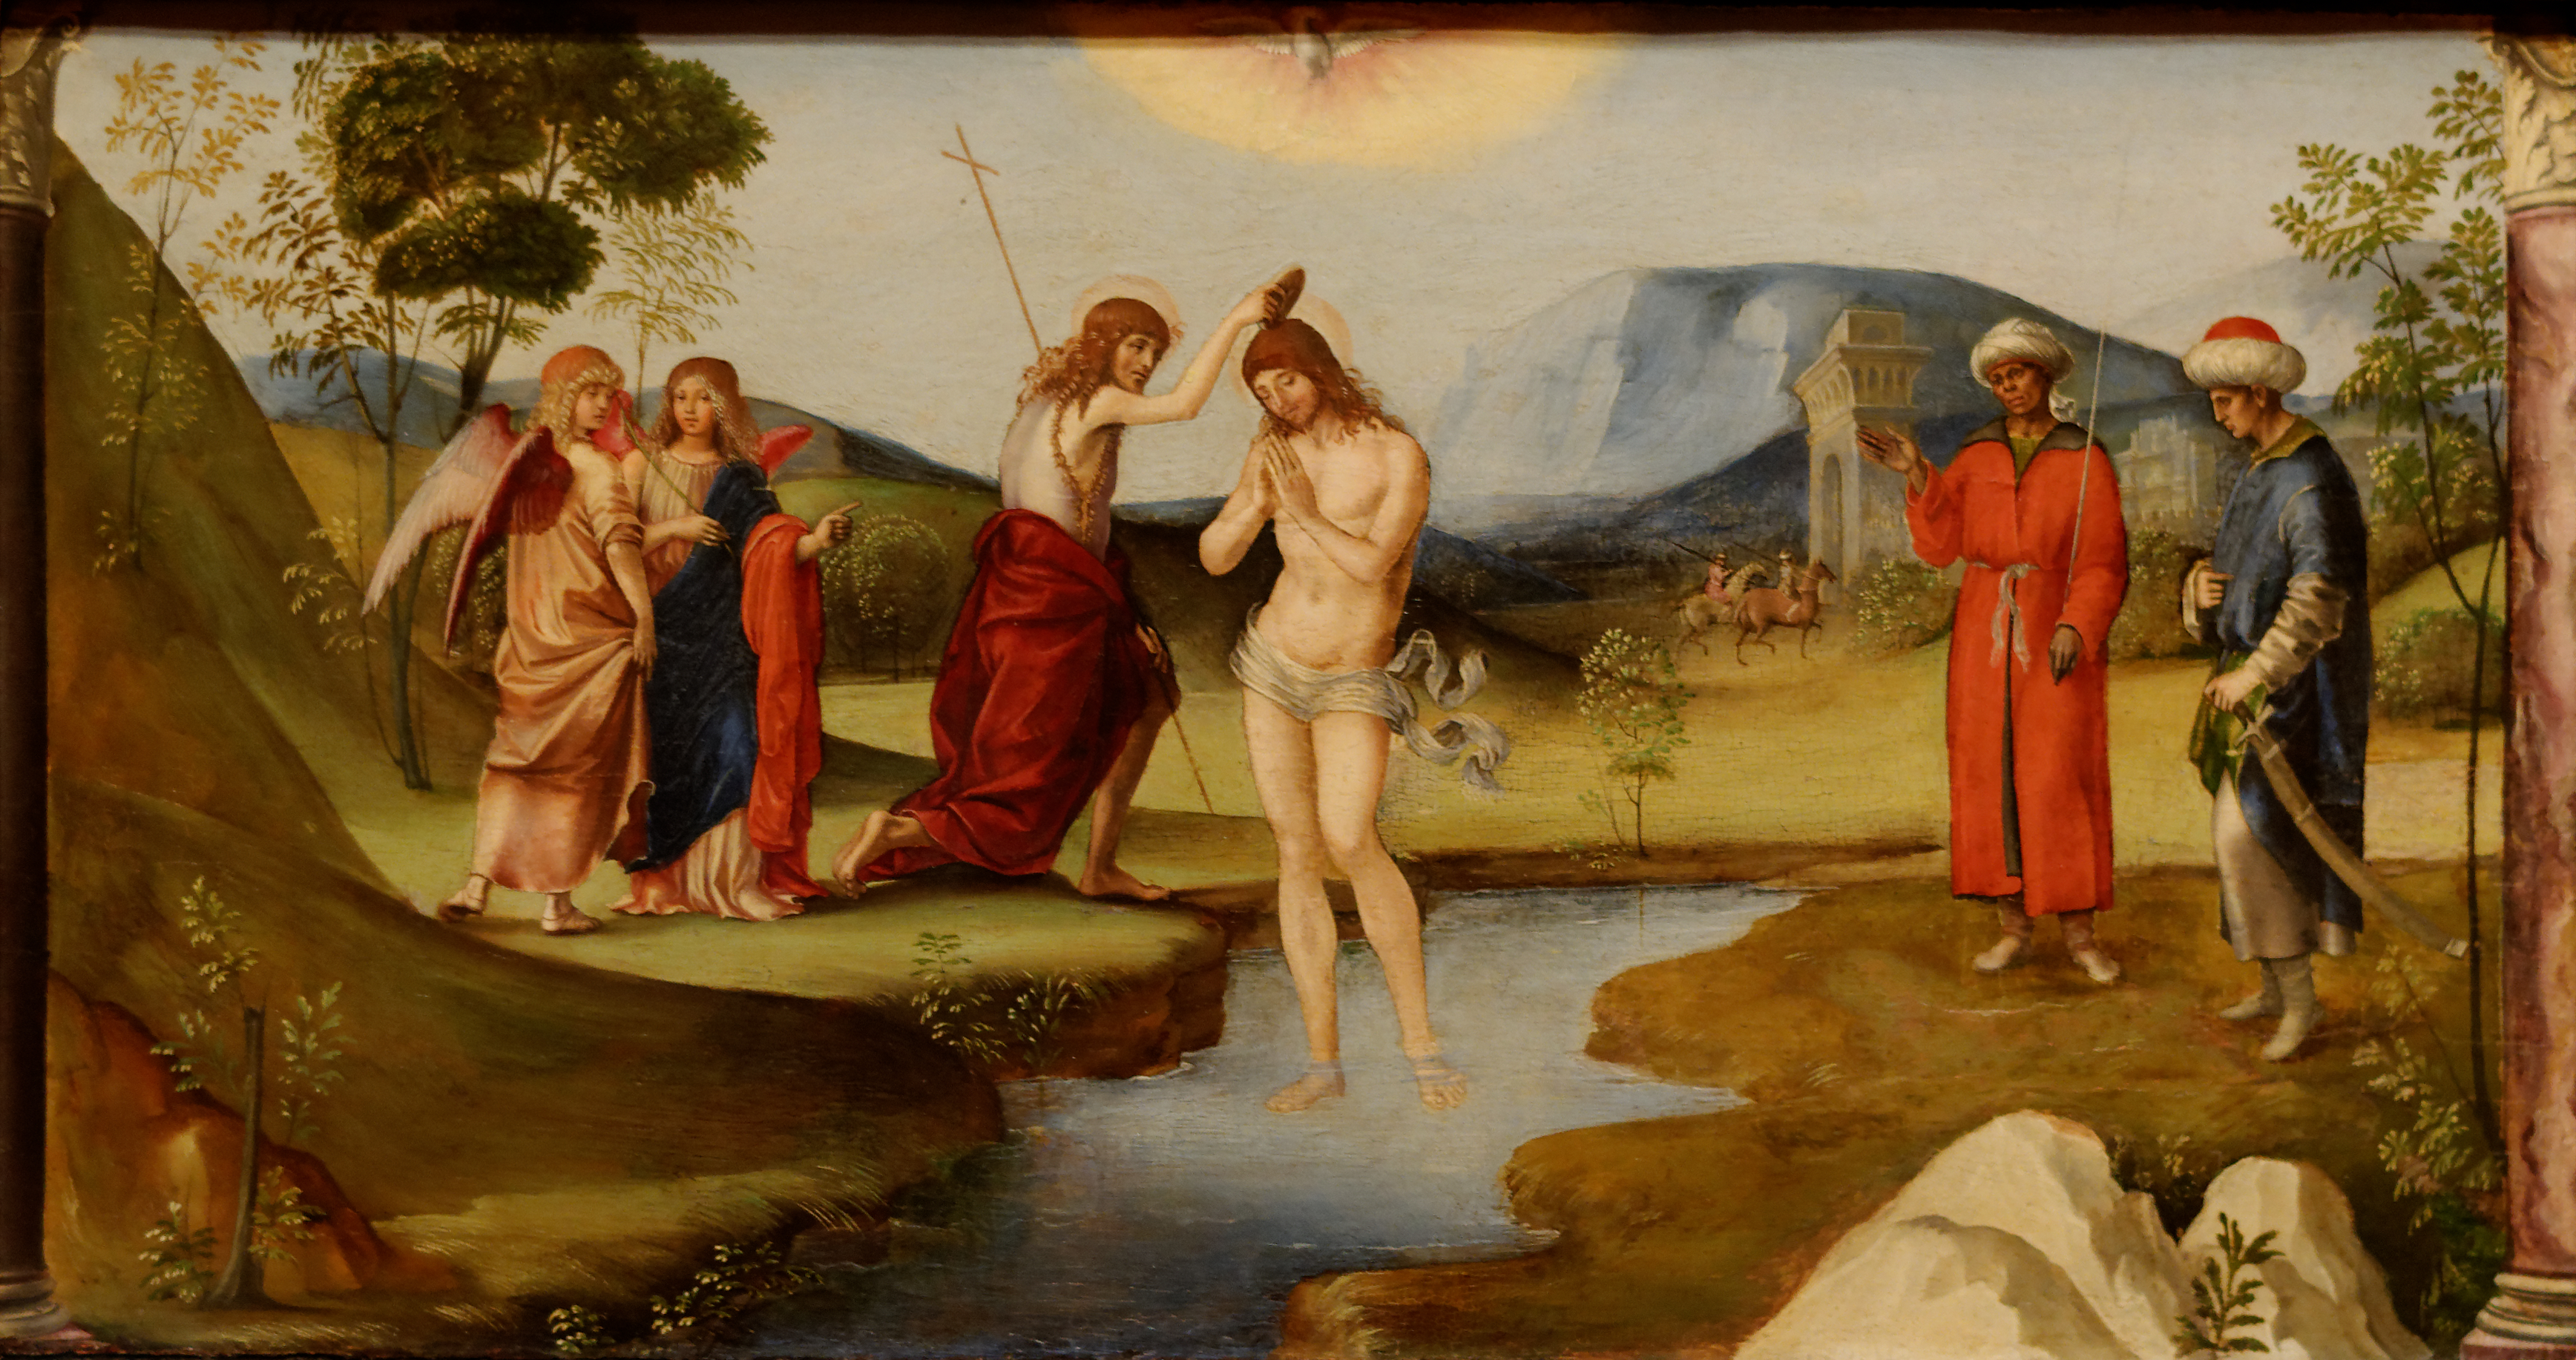 File:Baptism of Christ Francesco Francia 1490.jpg